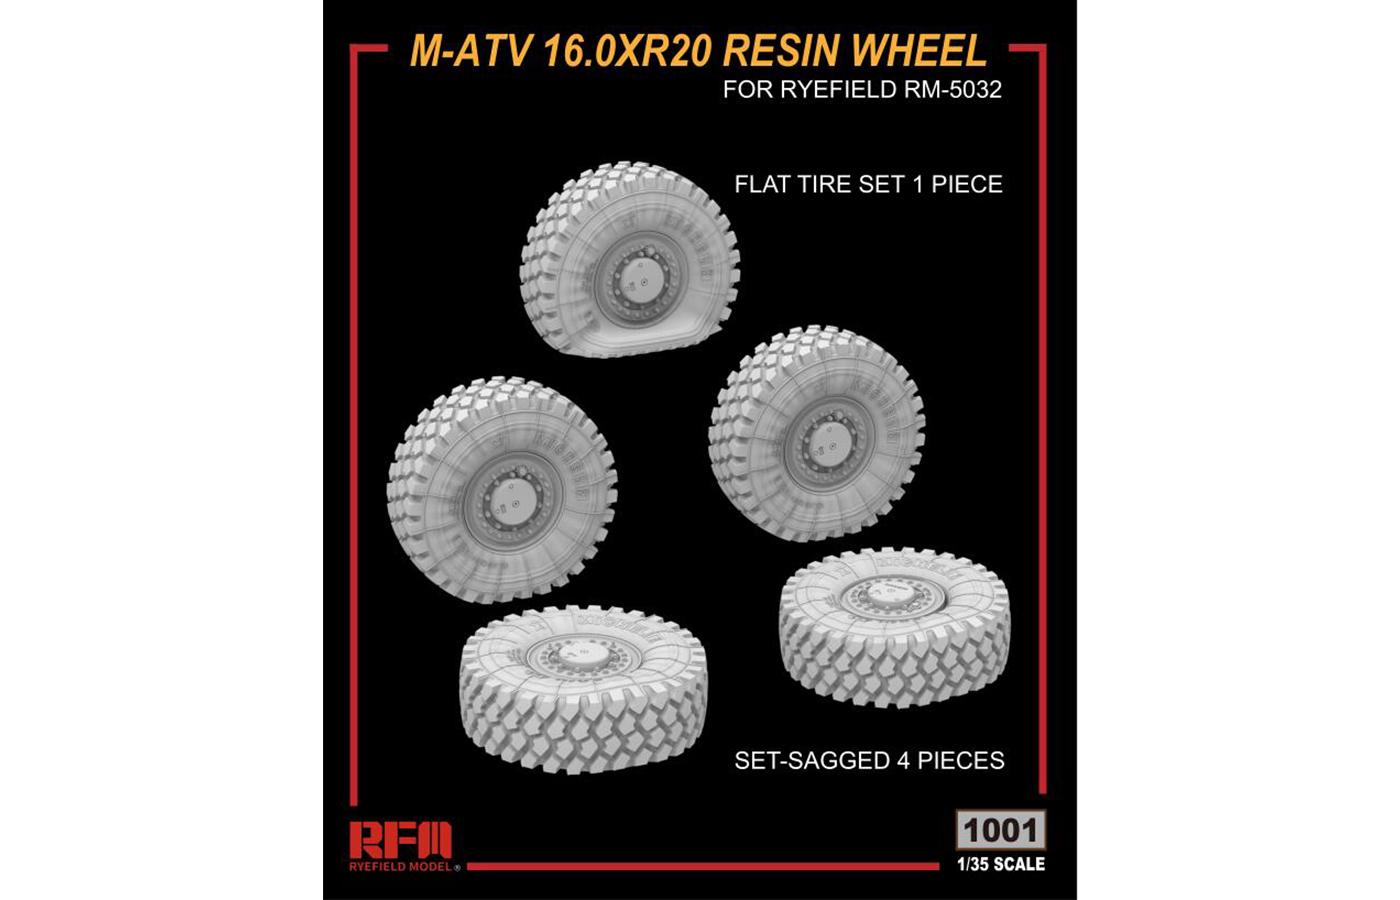 RM-1001 M-ATV 16.0*R20 树脂重力轮胎